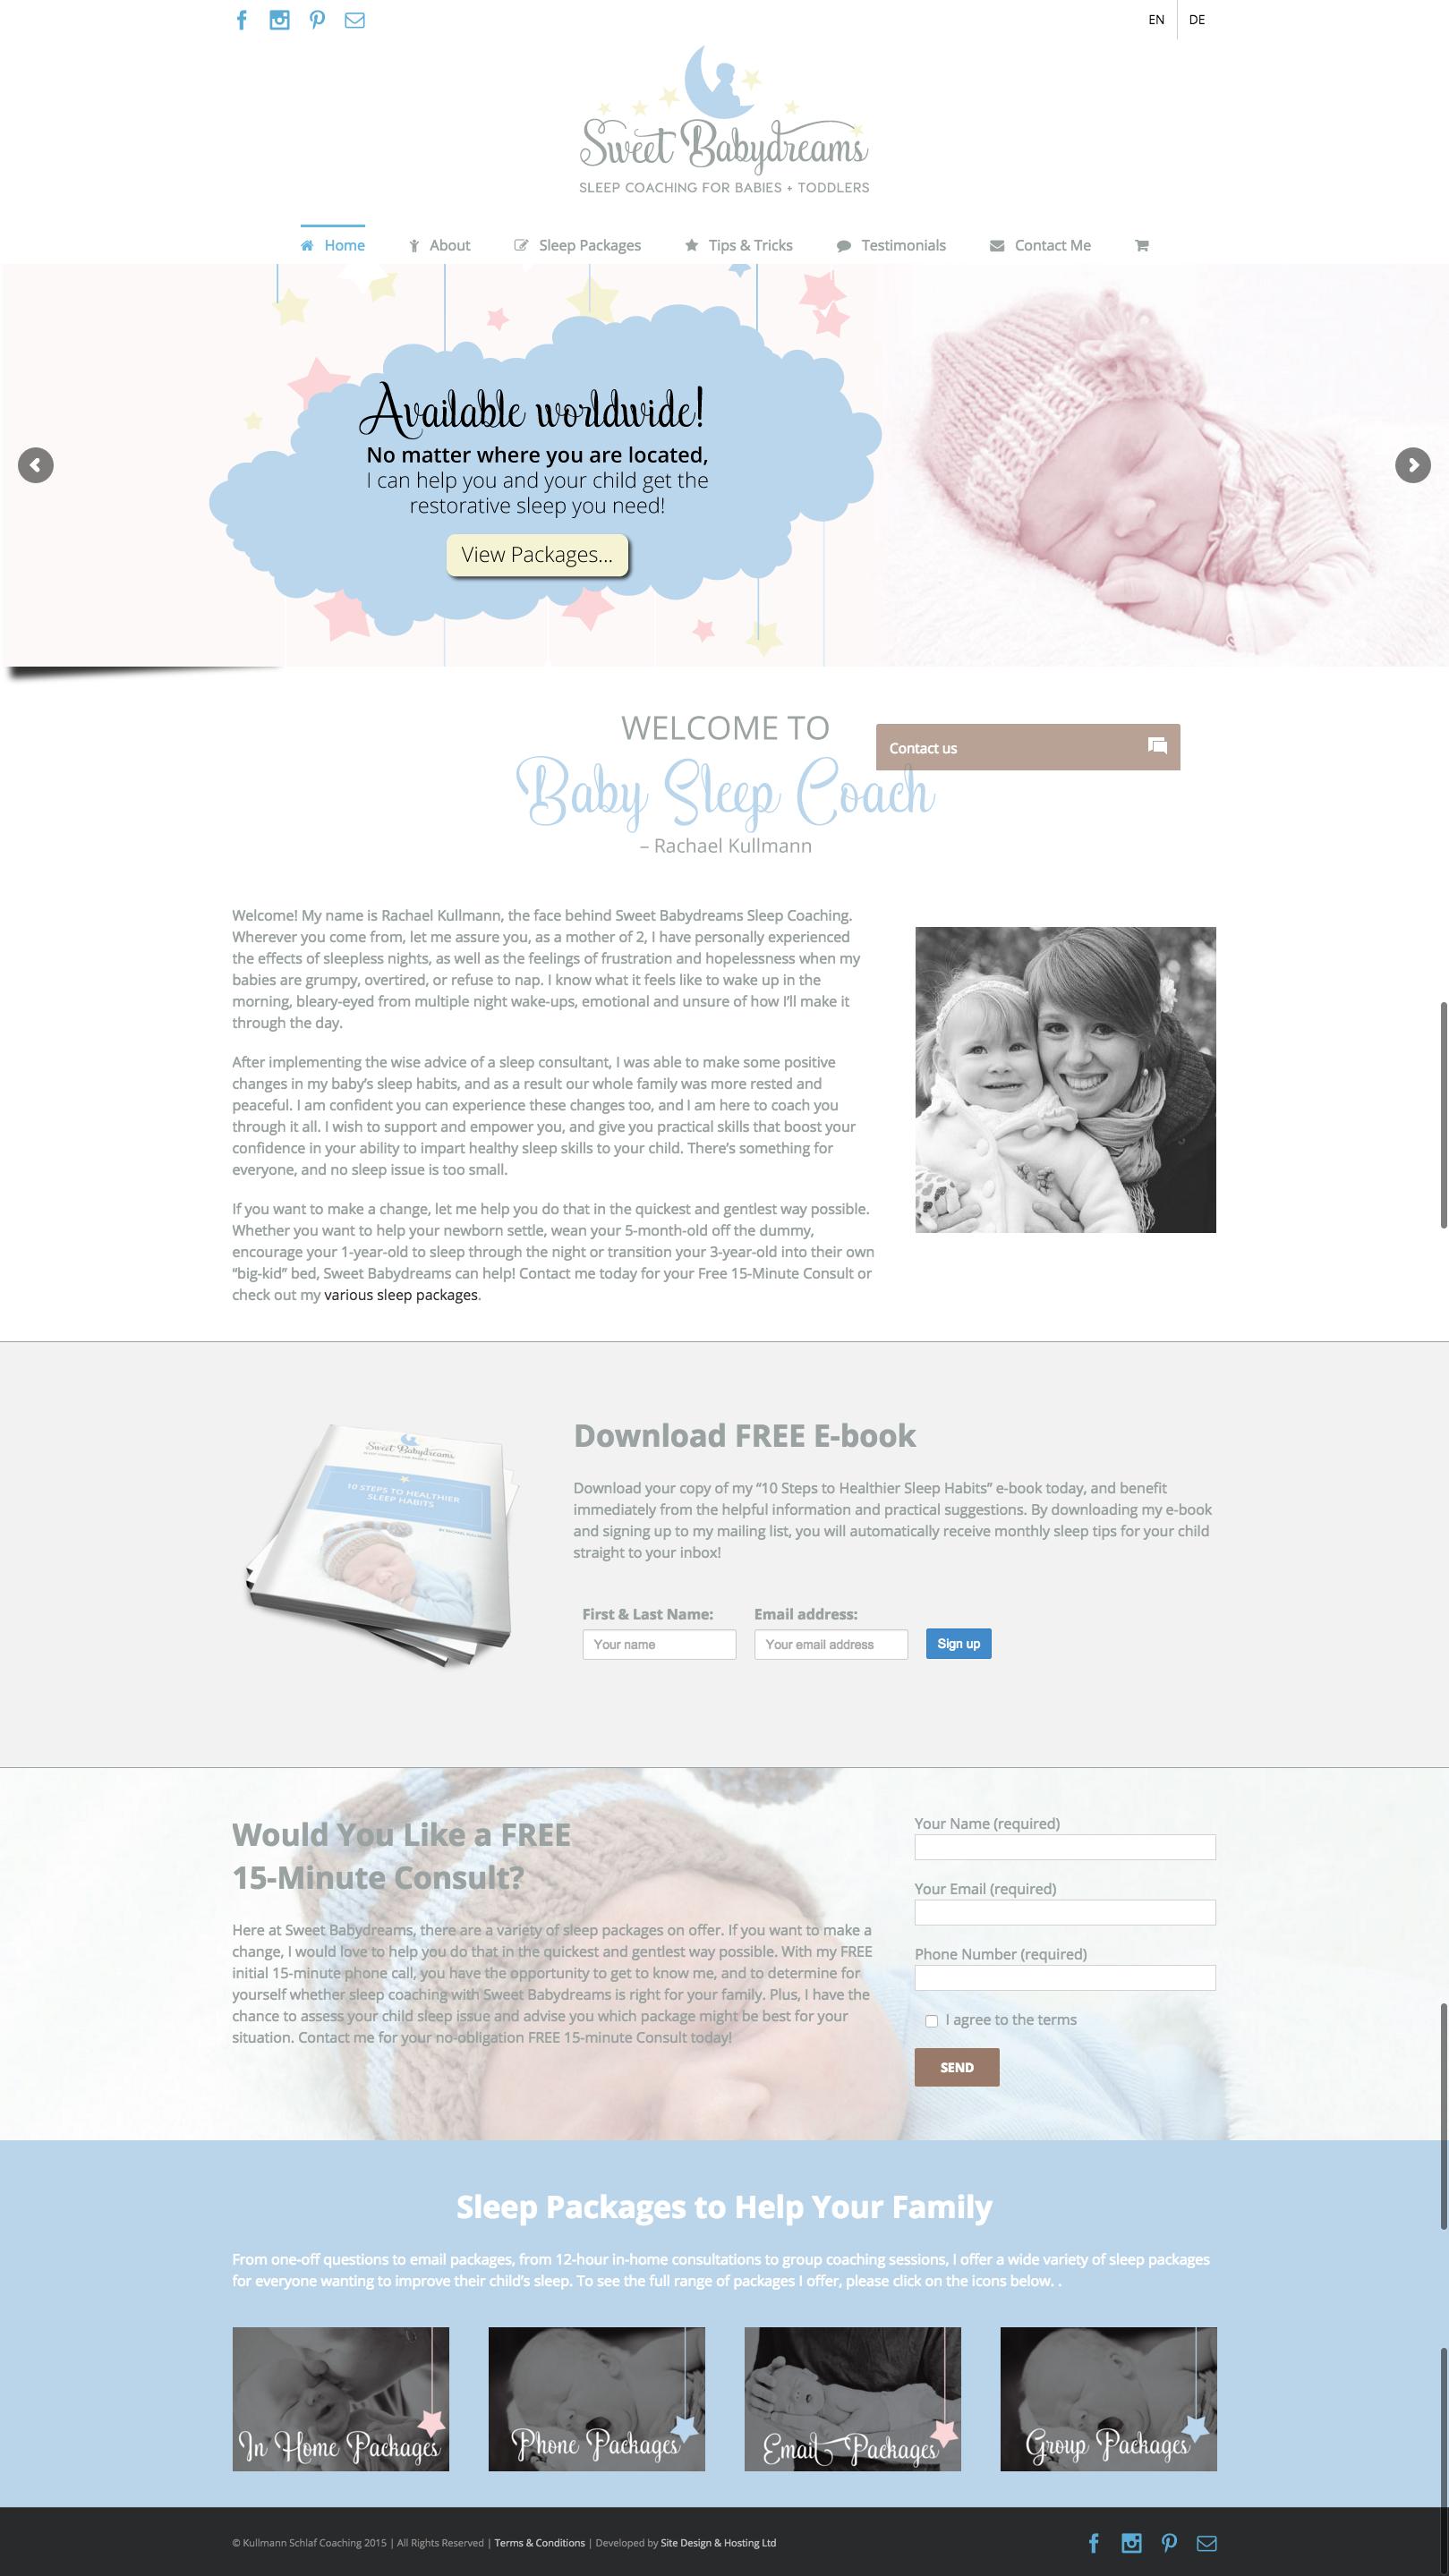 Website Design - Baby Sleep Coach